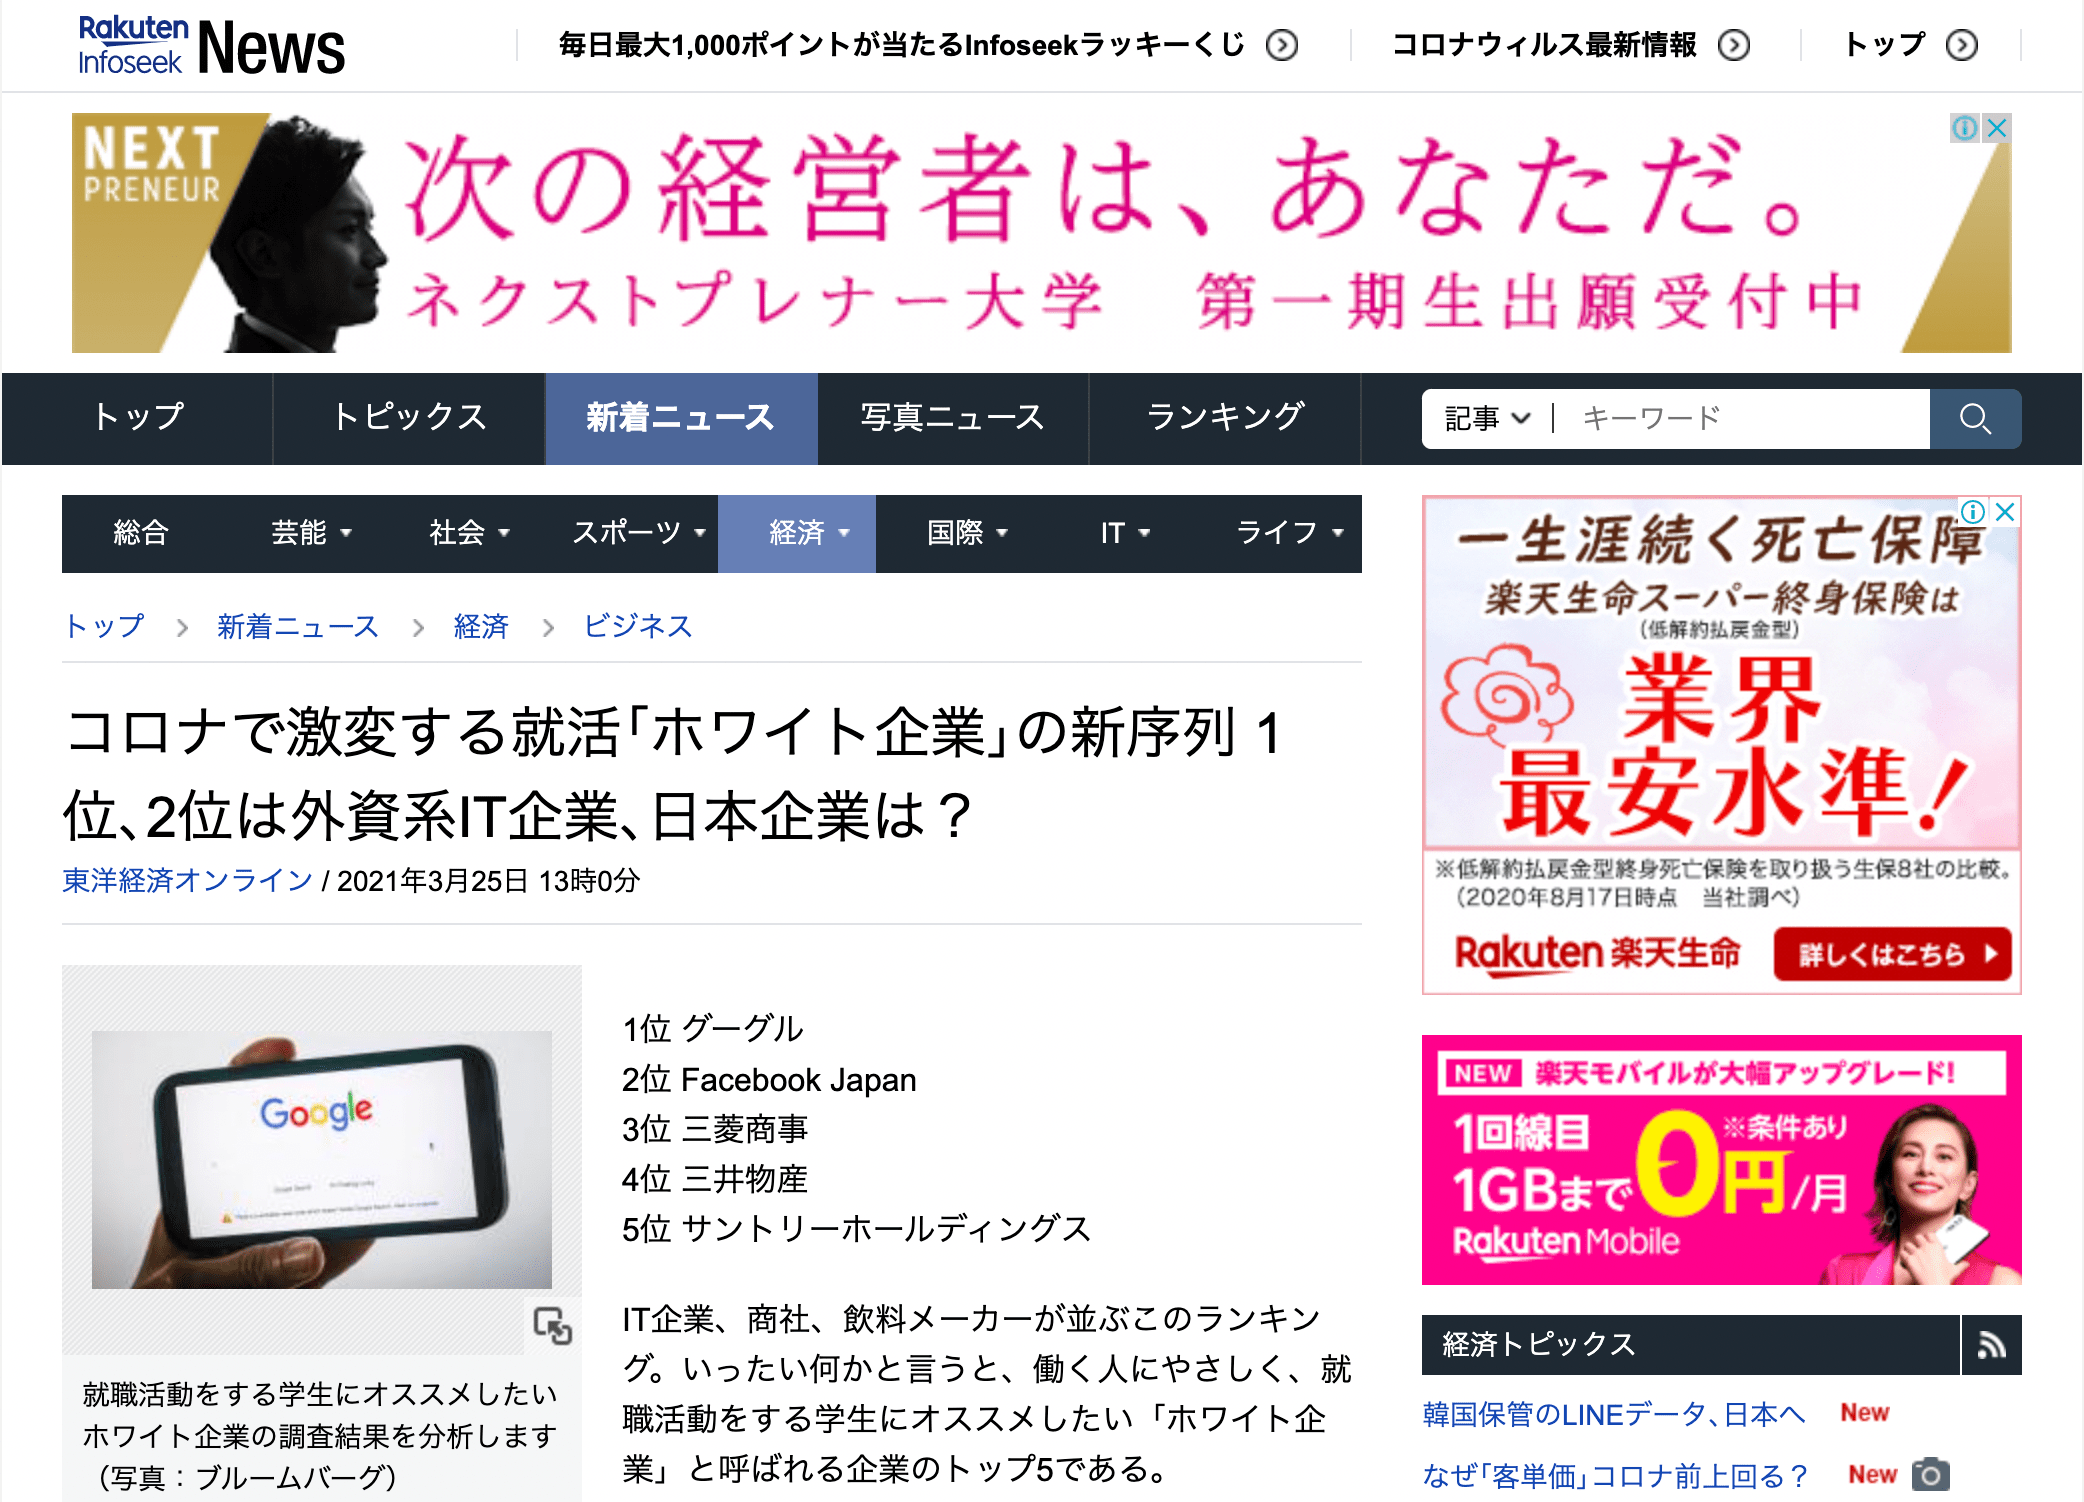 Rakuten Infoseek Newsでの紹介記事